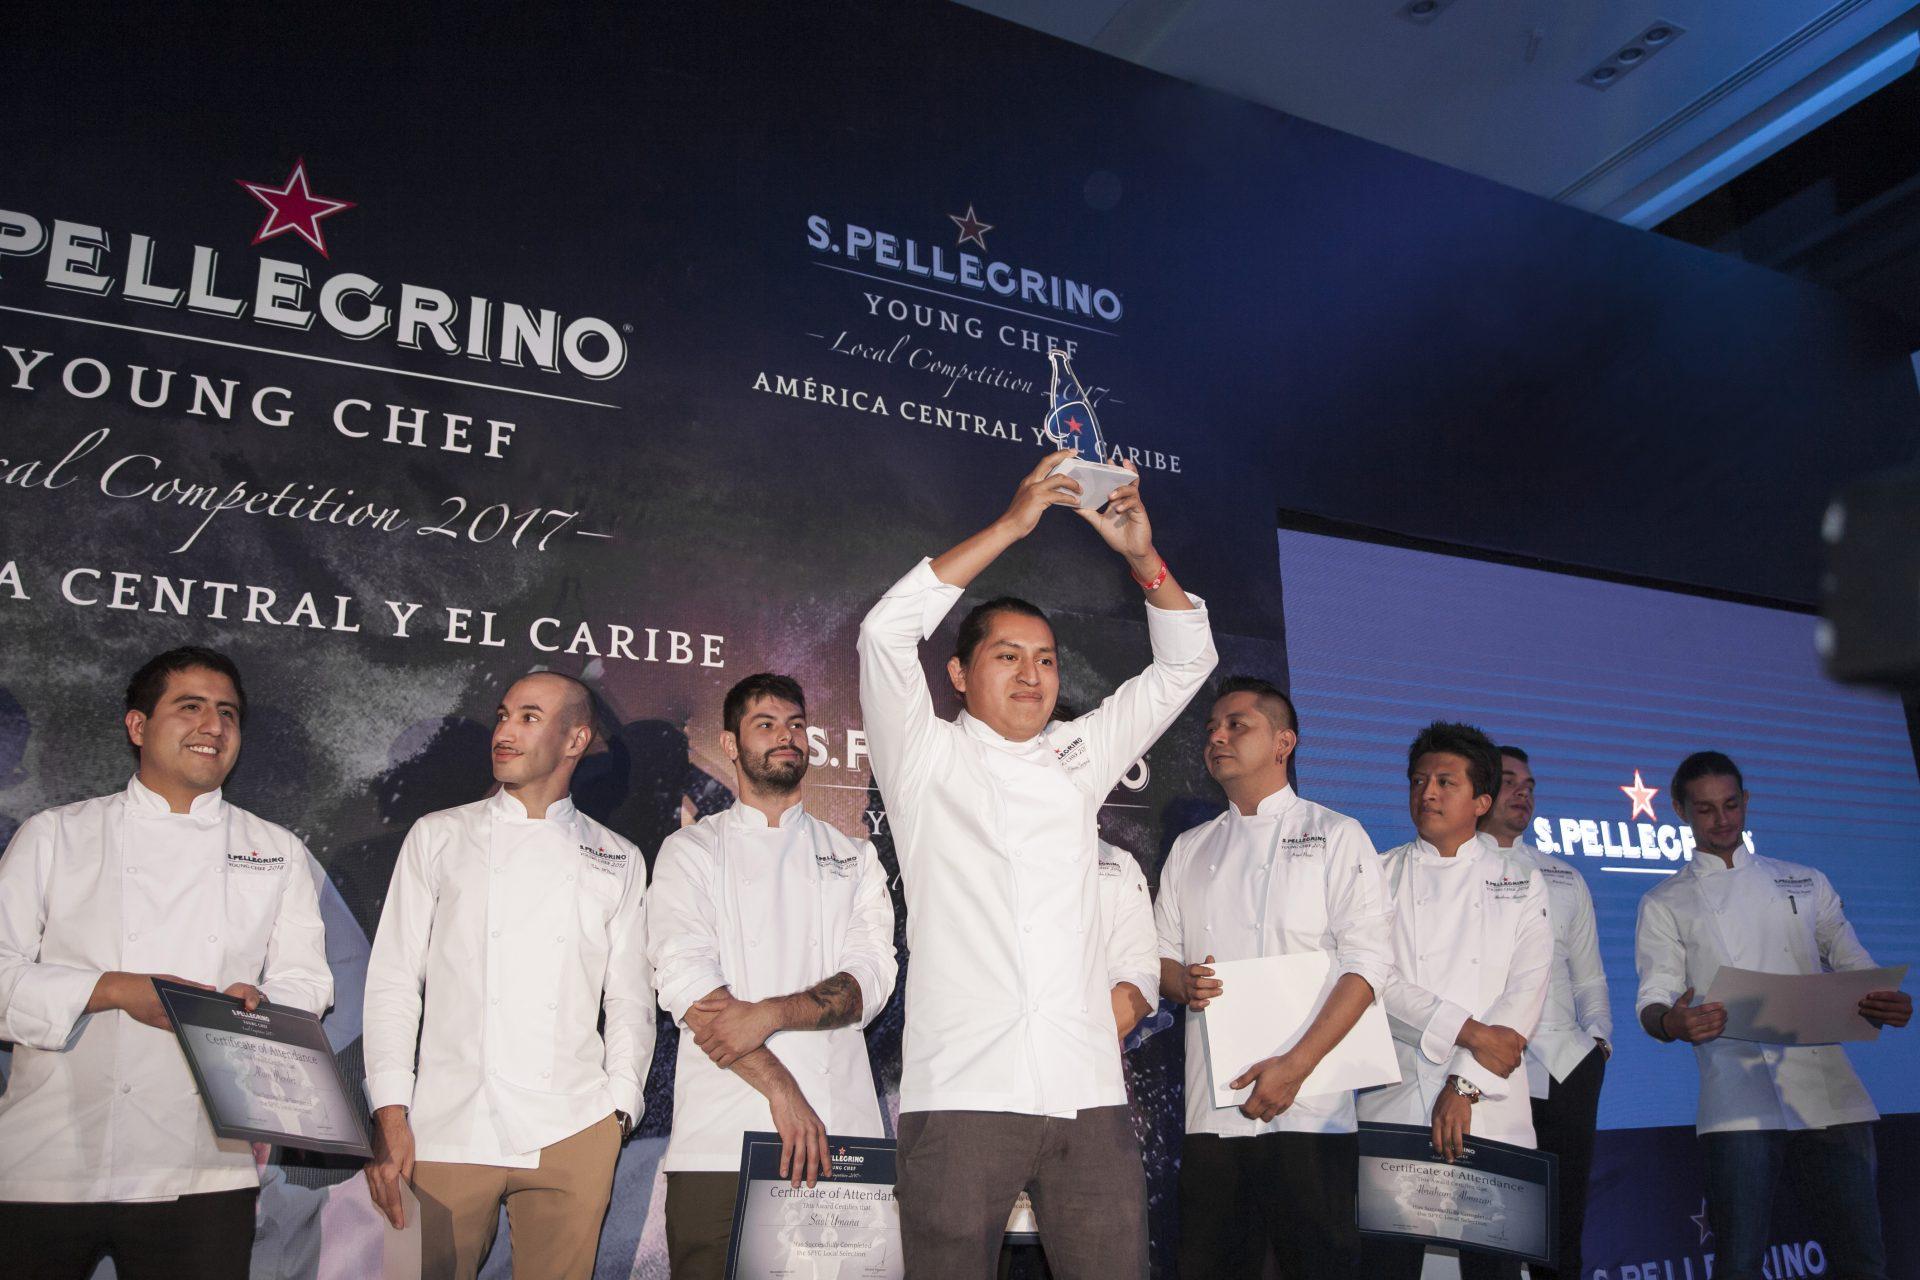 Rumbo a la Final de S. Pellegrino Young Chef 2018